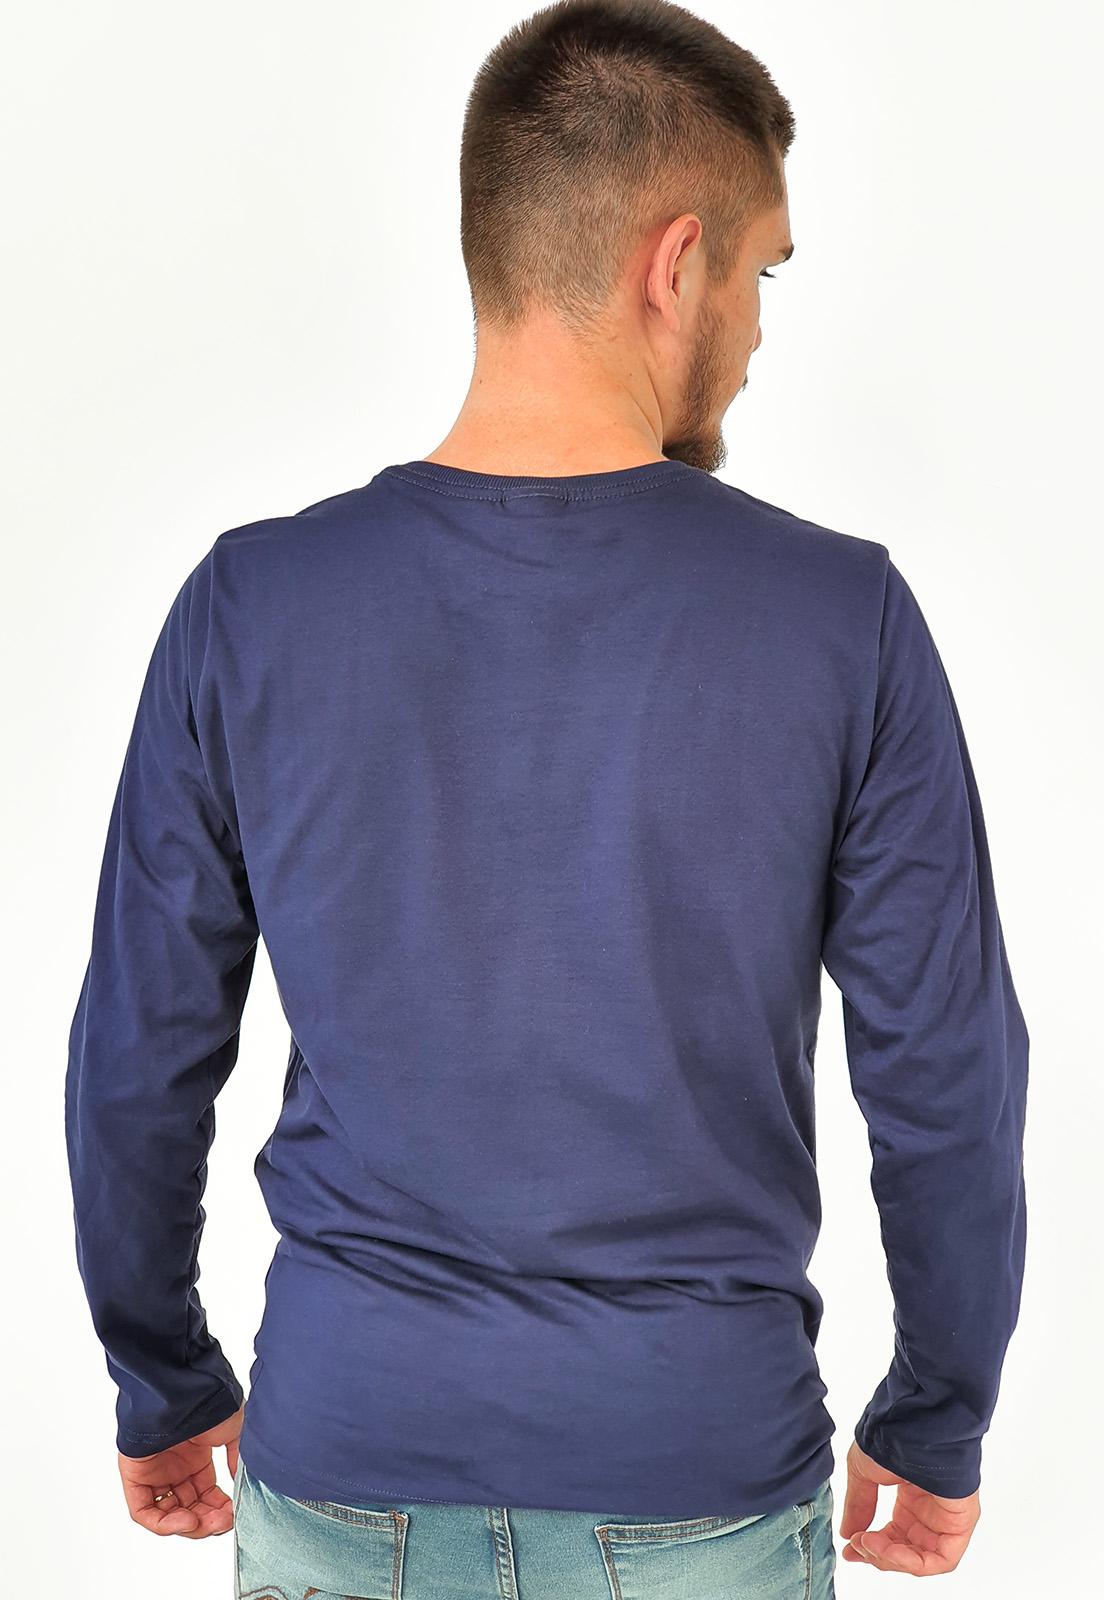 Camiseta Manga Longa King&Joe Básica Azul Marinho